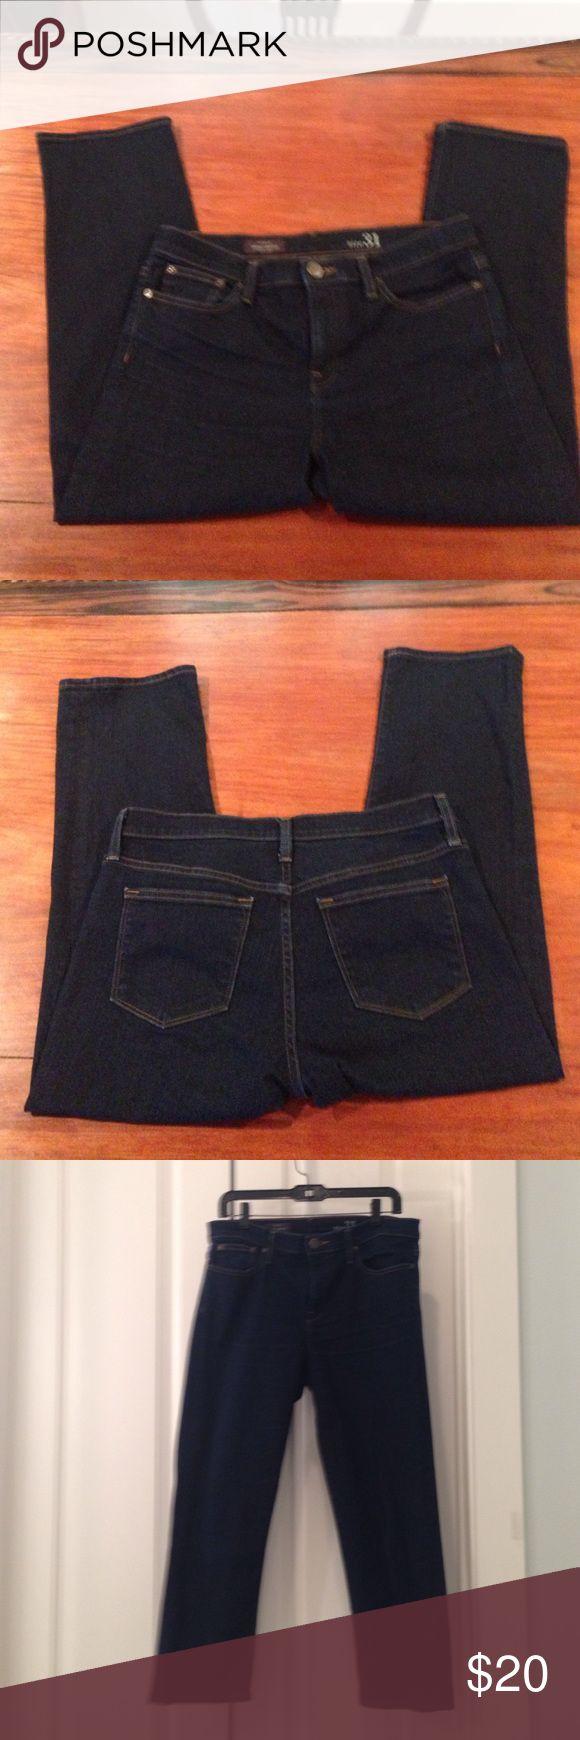 "J. Crew Cropped Jeans J. Crew Vintage Cropped jean.  25"" inseam. Dark wash.  92% cotton, 6% polyester, 2% elastase. J. Crew Jeans Ankle & Cropped"